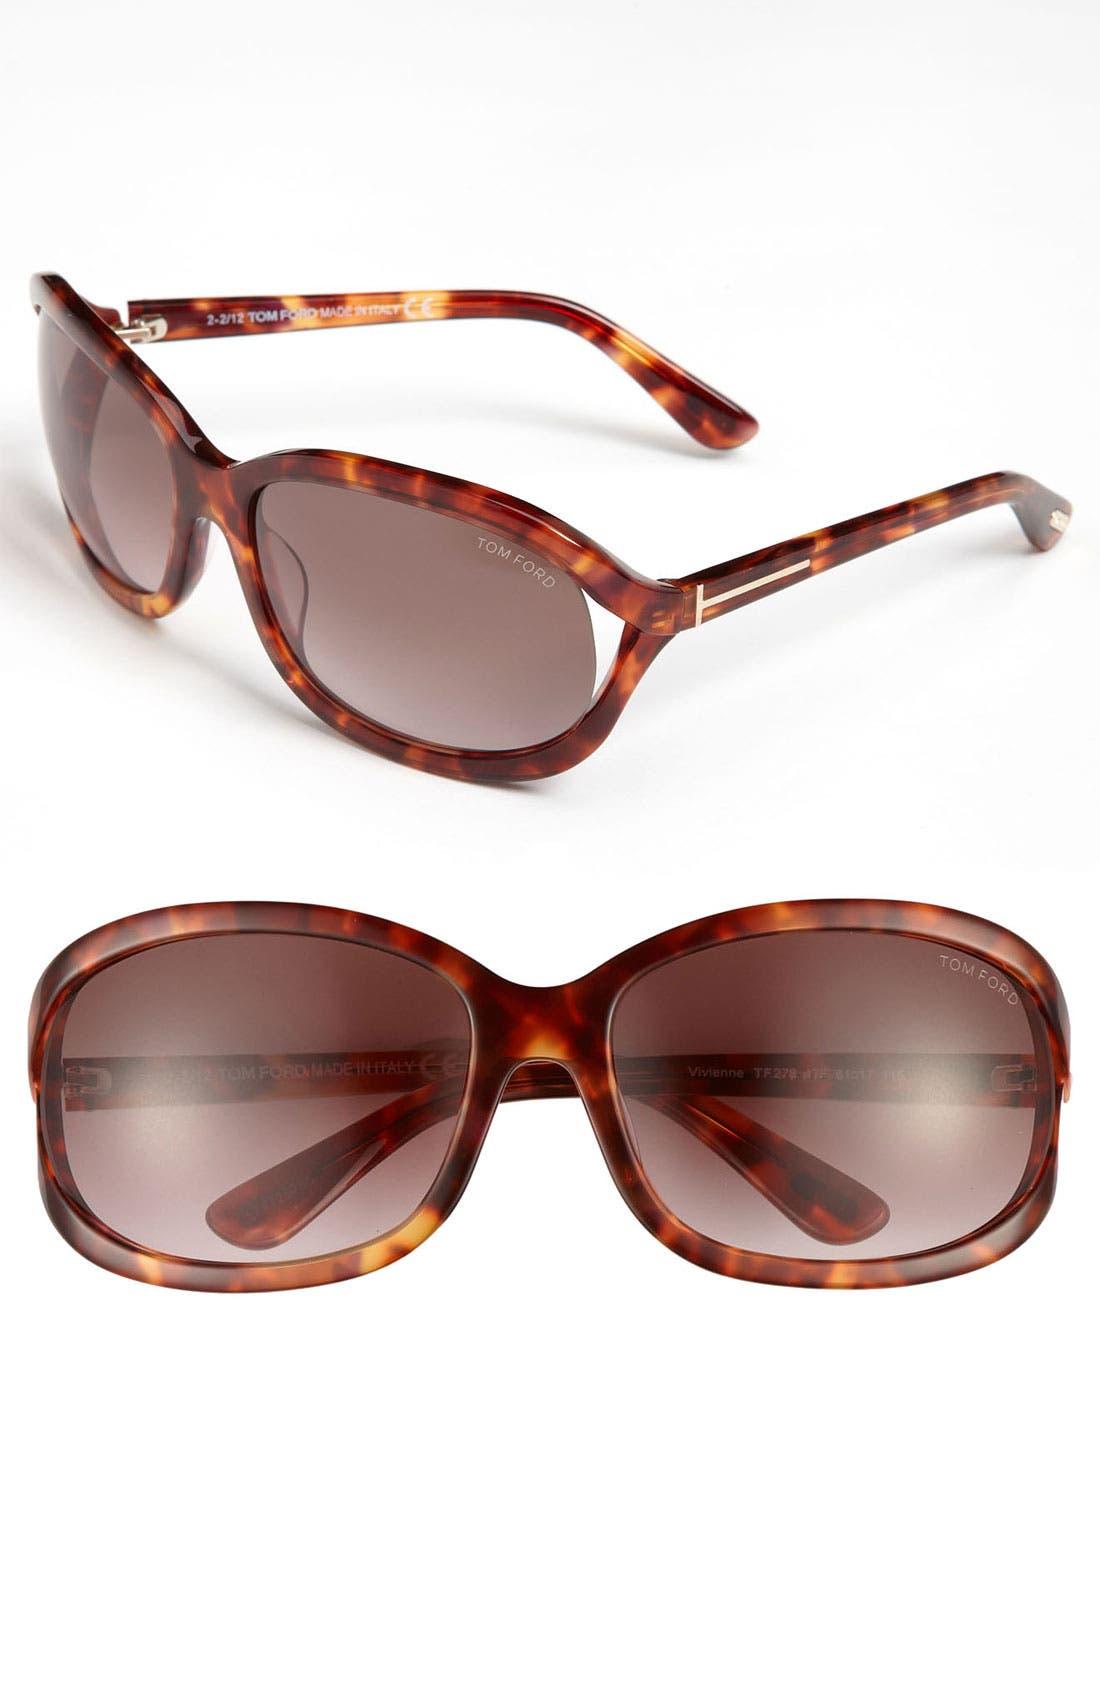 Alternate Image 1 Selected - Tom Ford 'Vivienne' 61mm Sunglasses